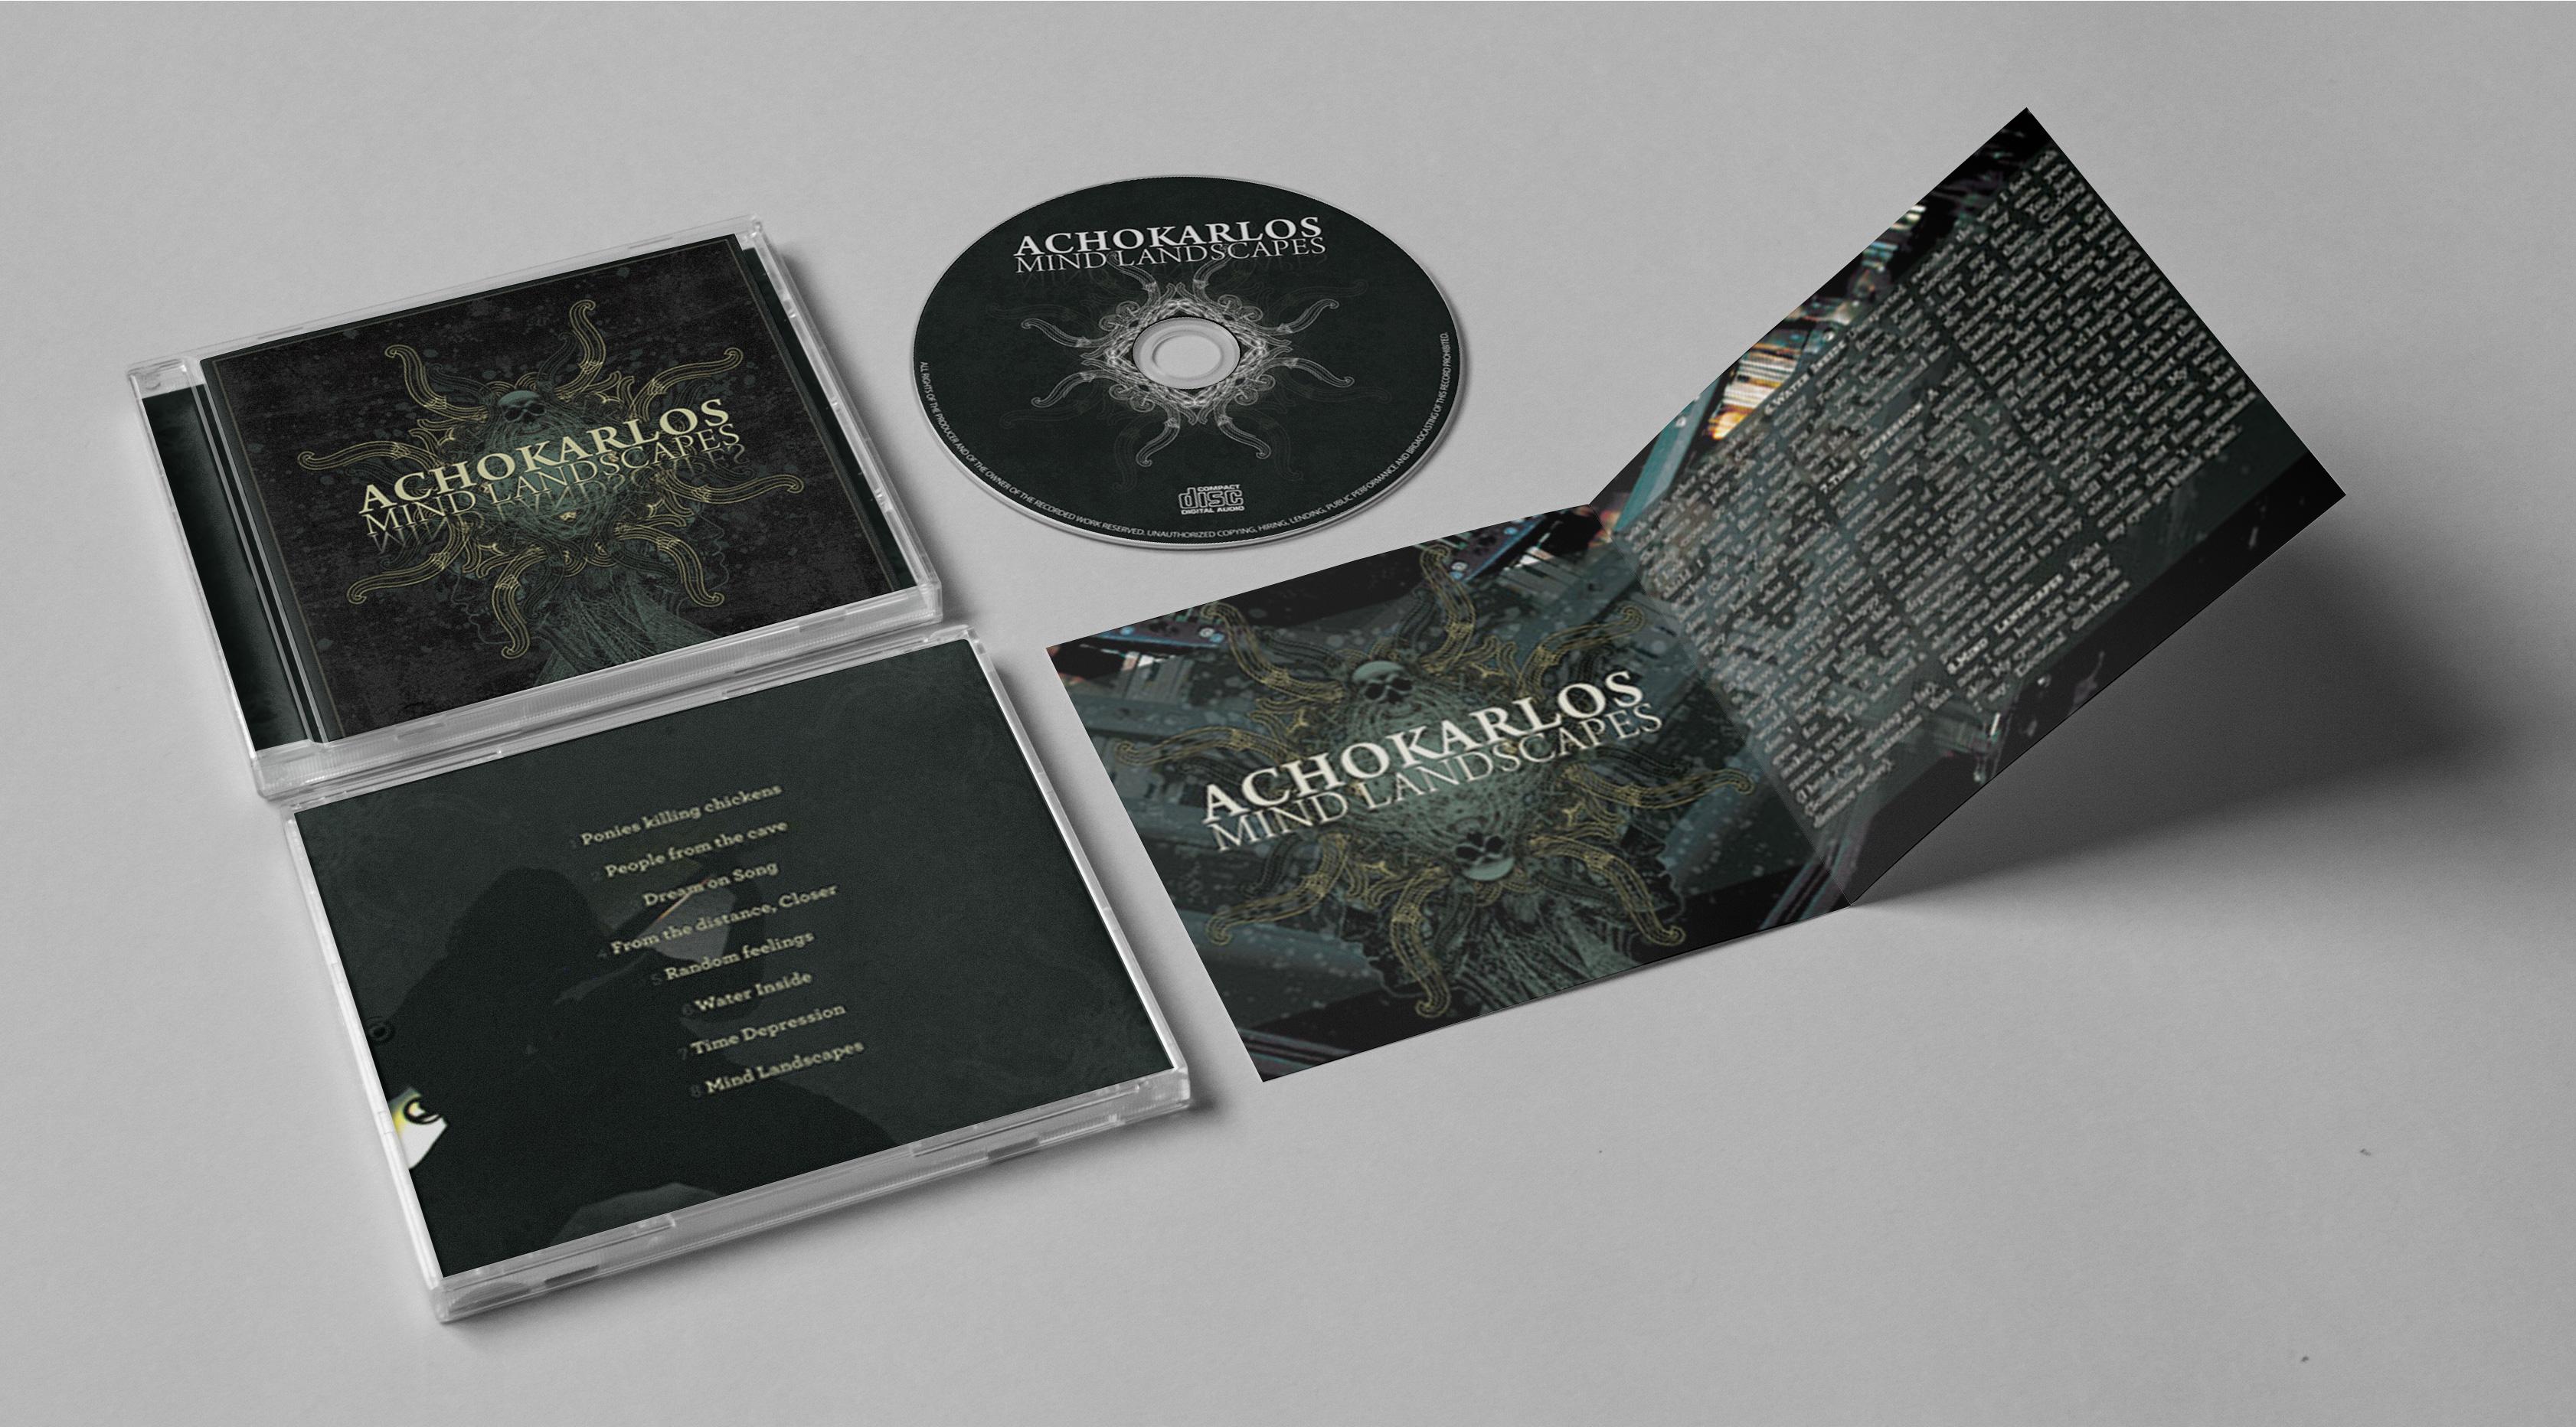 achokarlos-cd